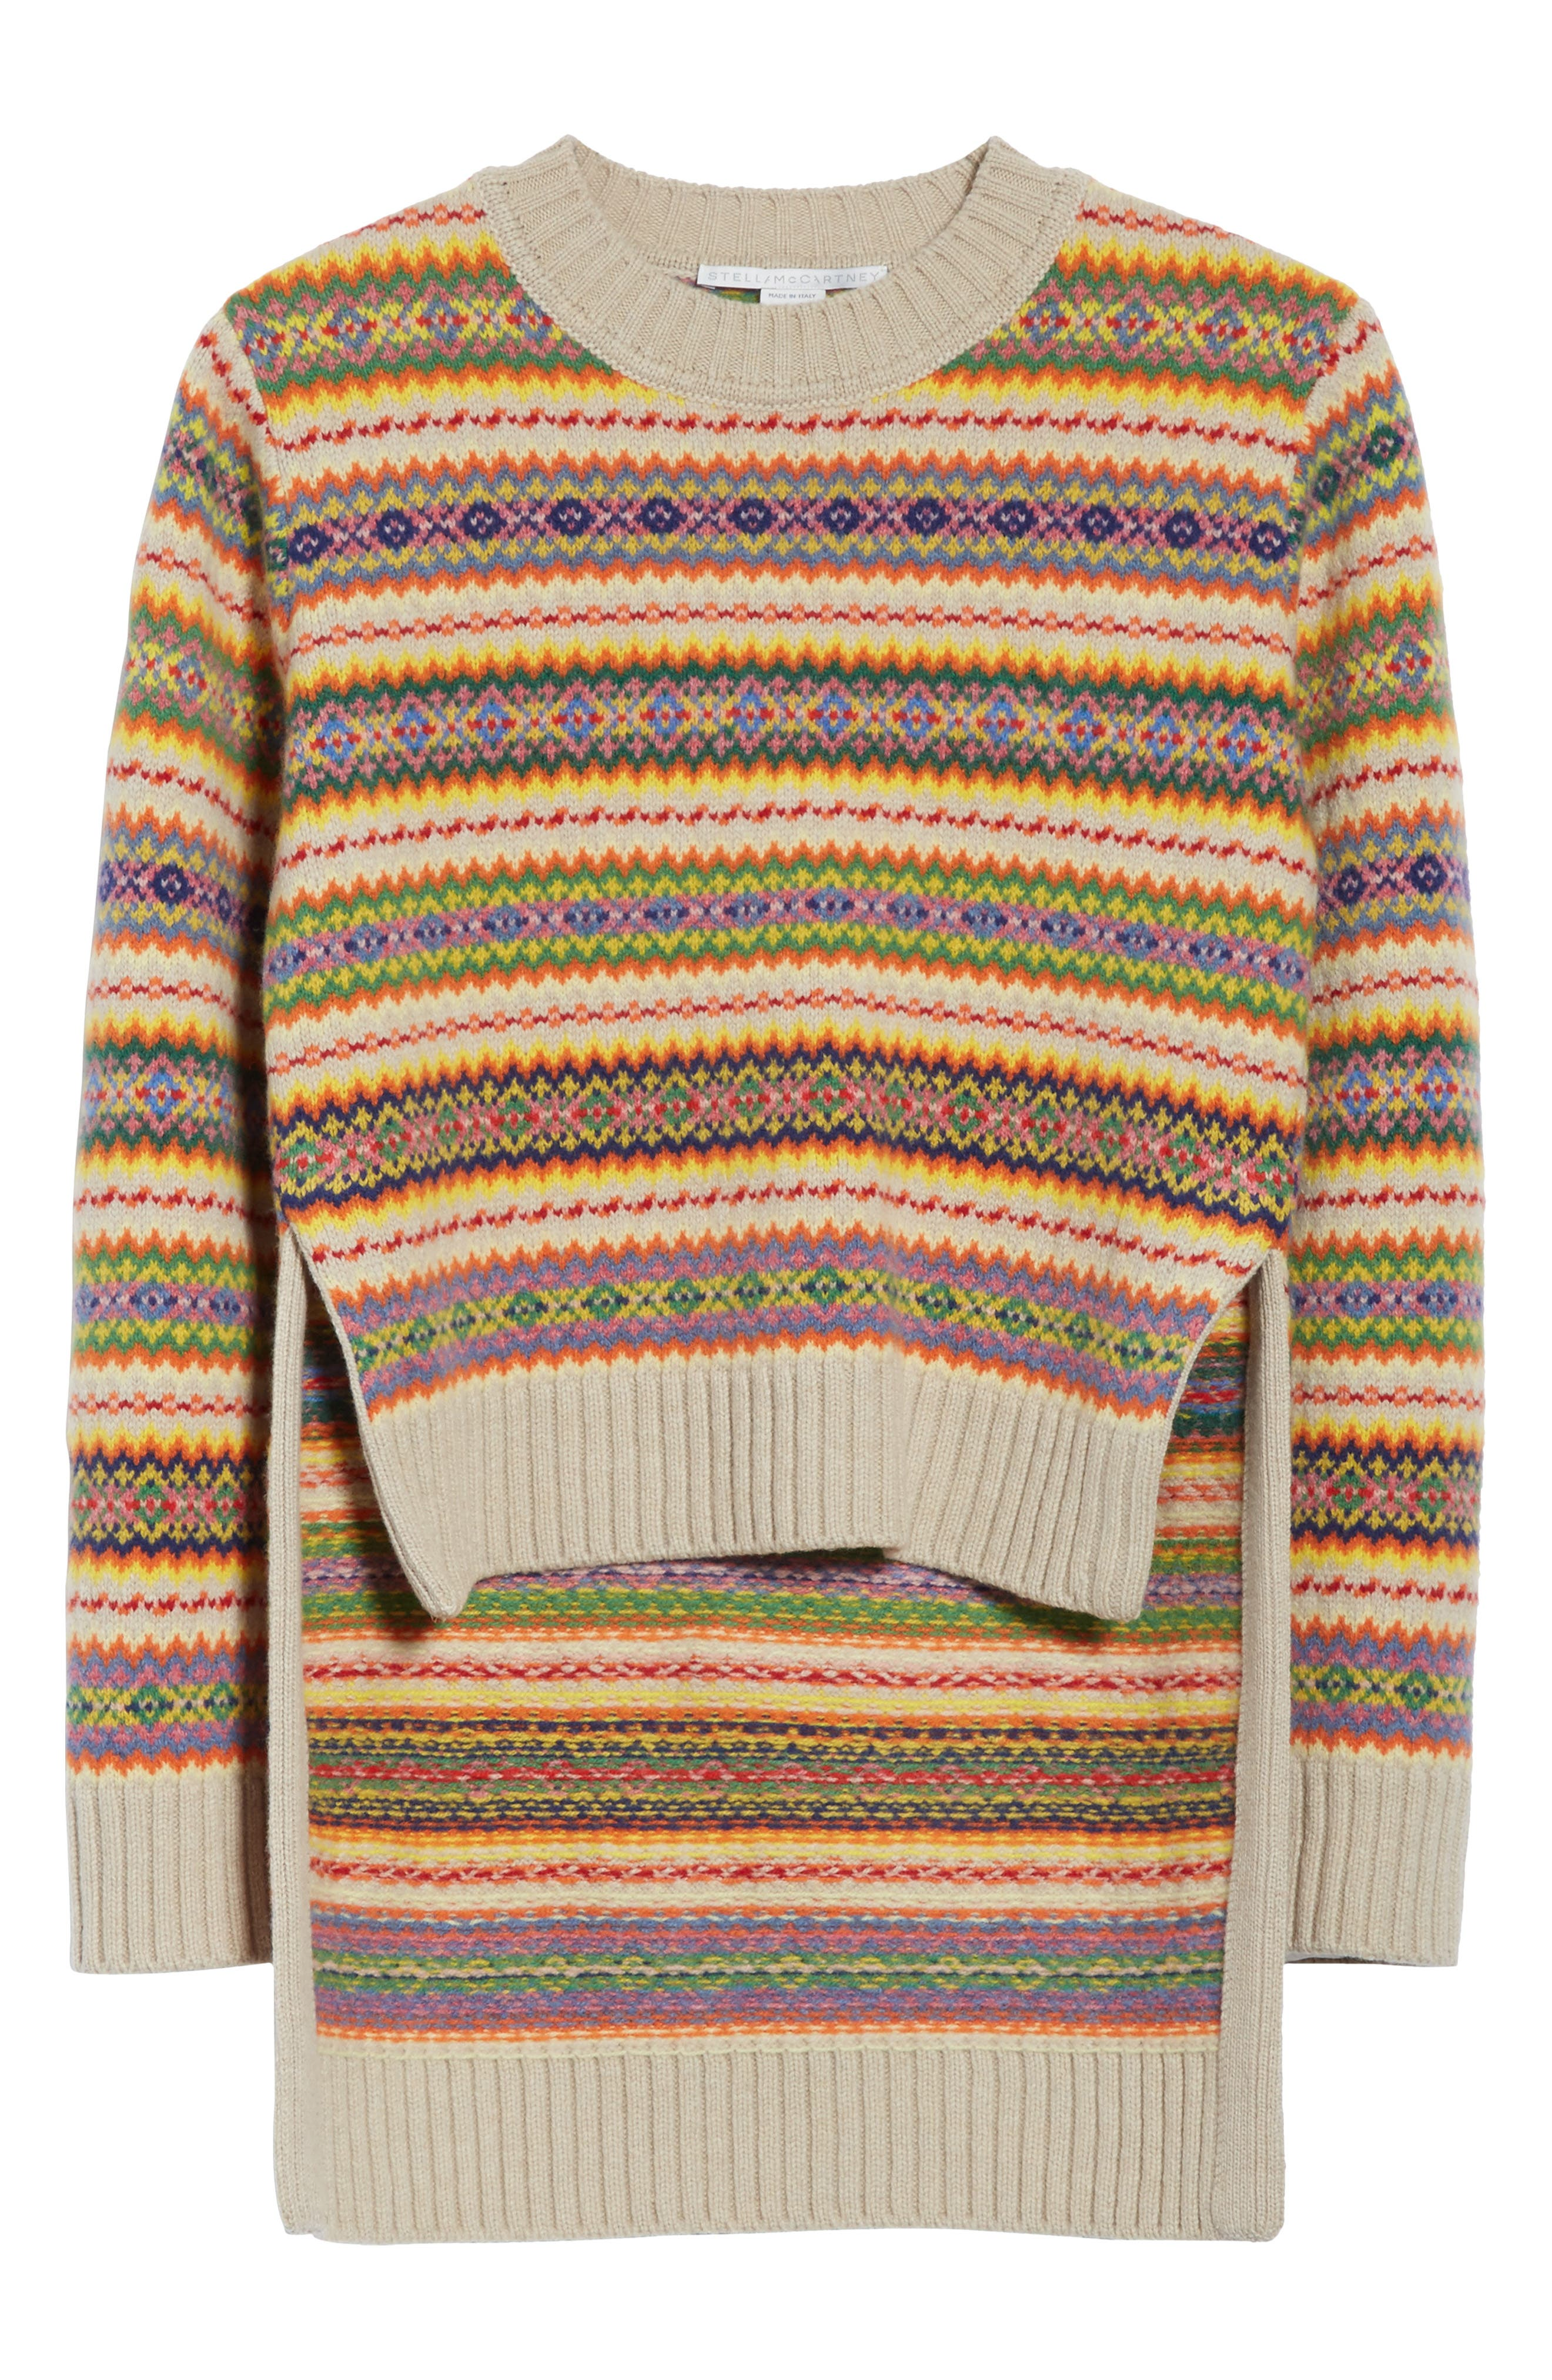 Shetland Wool Fair Isle Sweater,                             Alternate thumbnail 6, color,                             Multicolor